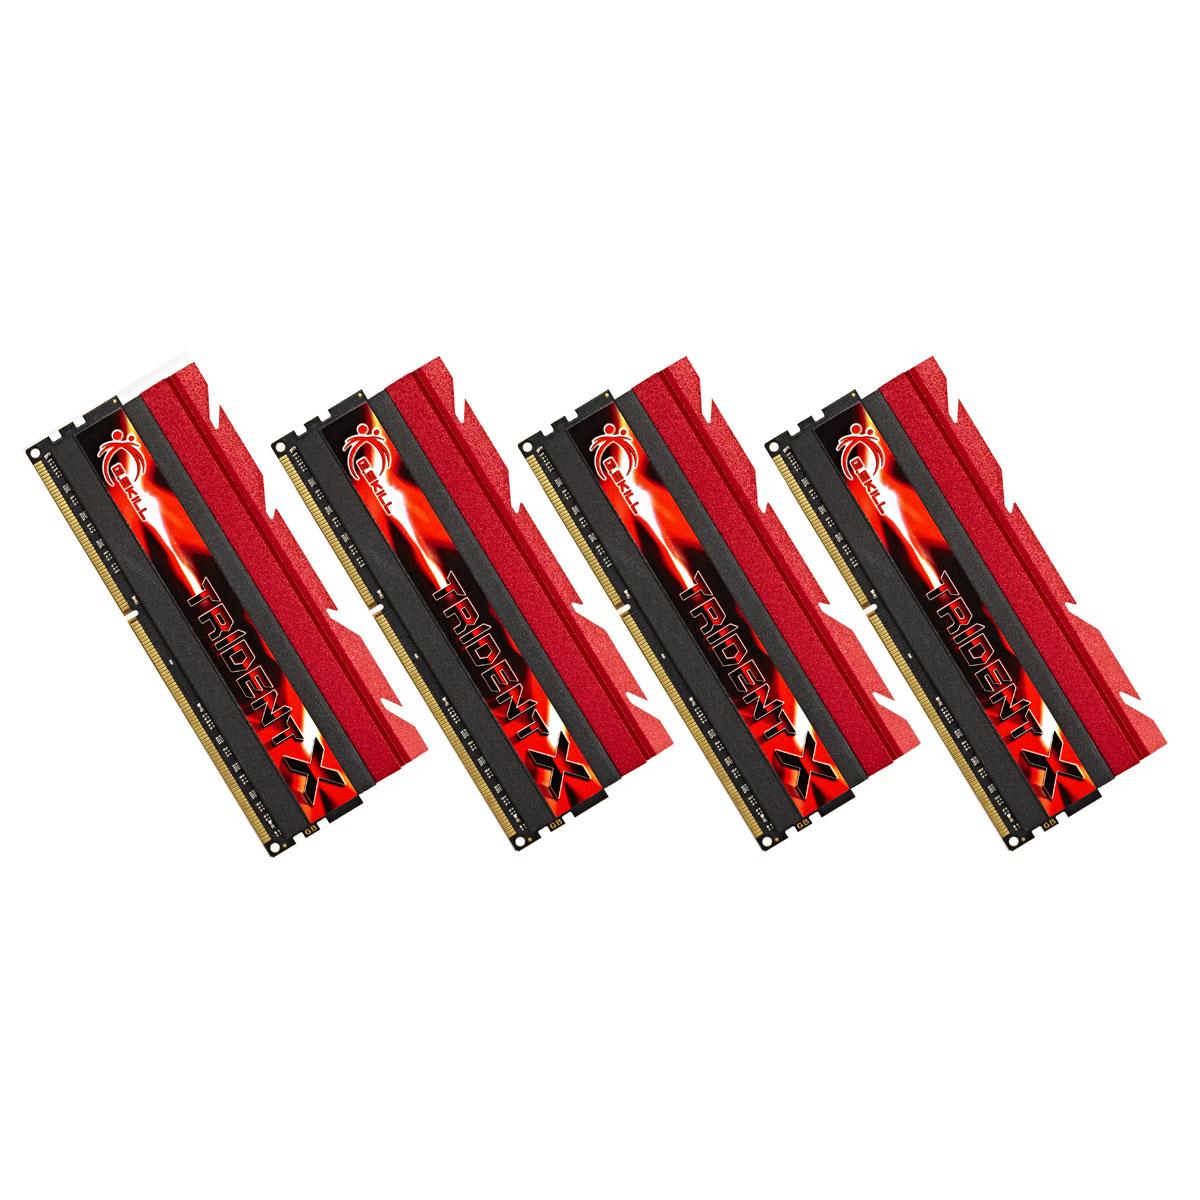 Mémoire PC G.Skill Trident X Series 16 Go (4x 4Go) DDR3 2400 MHz CL10 Kit Quad Channel DDR3 PC3-19200 - F3-2400C10Q-16GTX (garantie à vie par G.Skill)